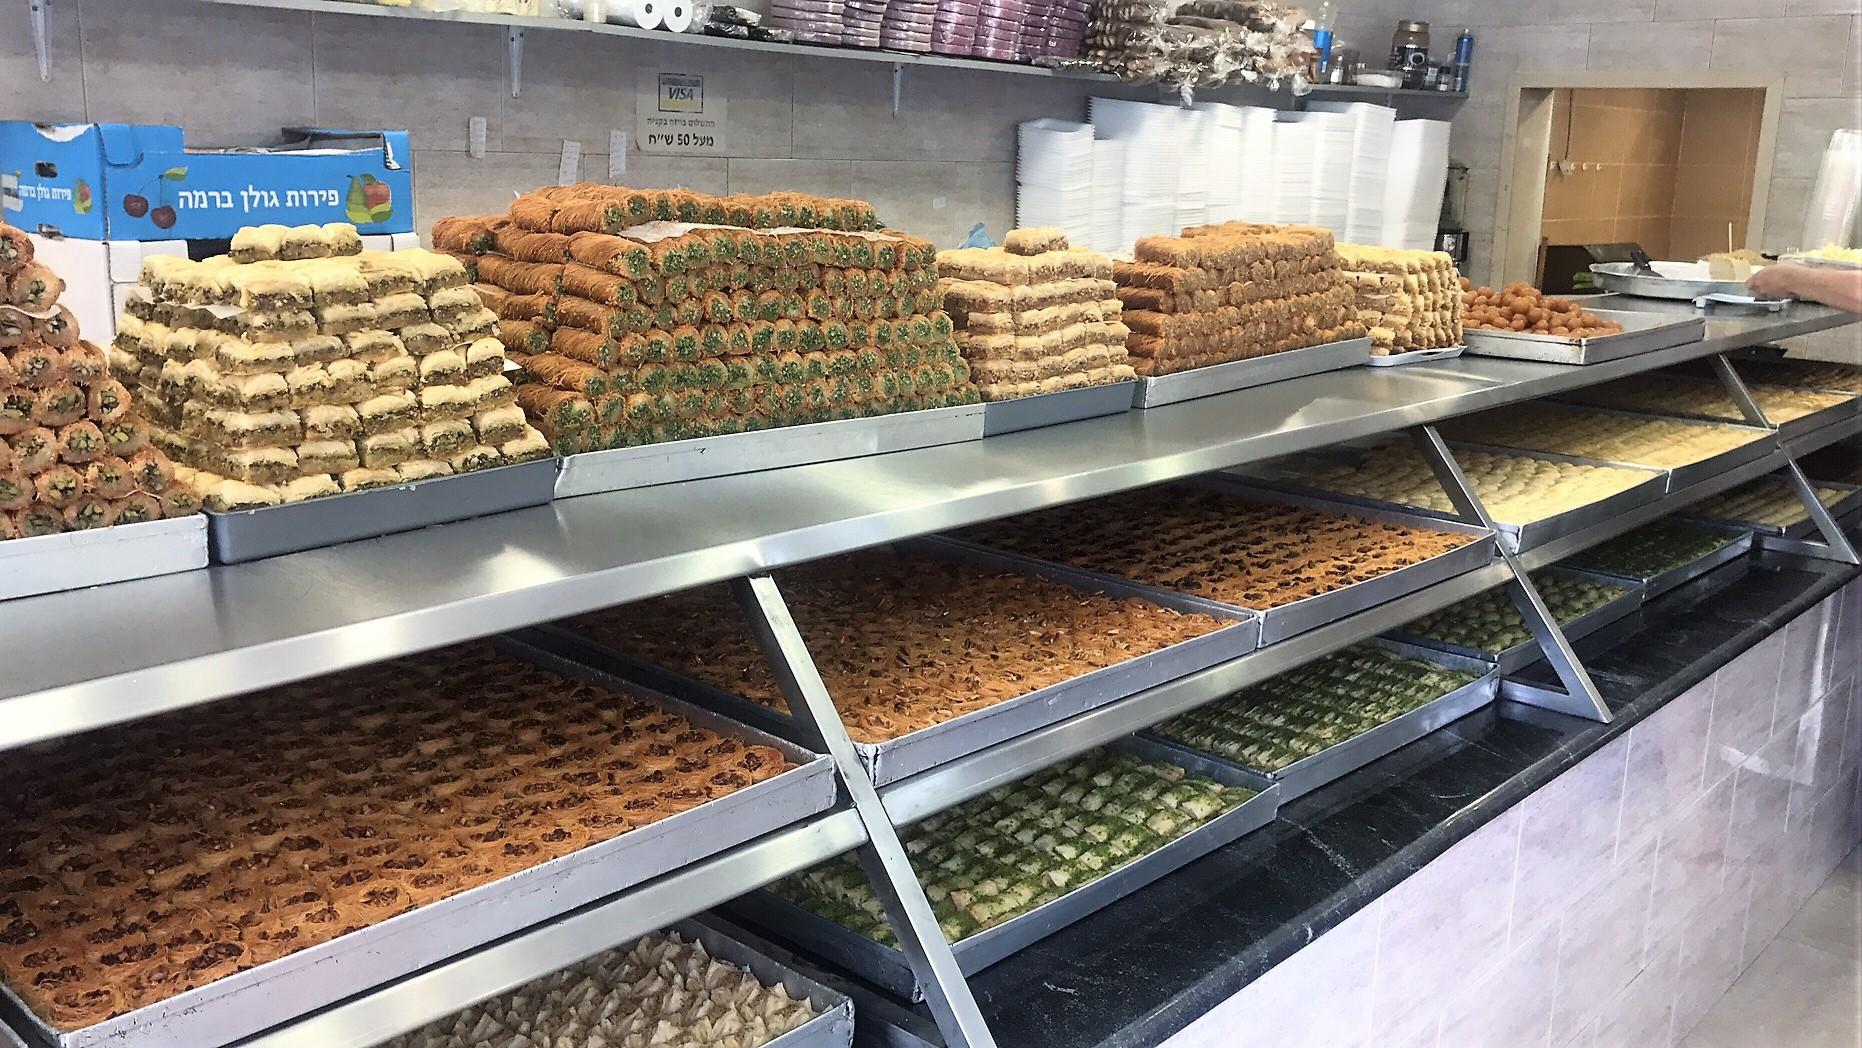 Bakery  HaMizrach